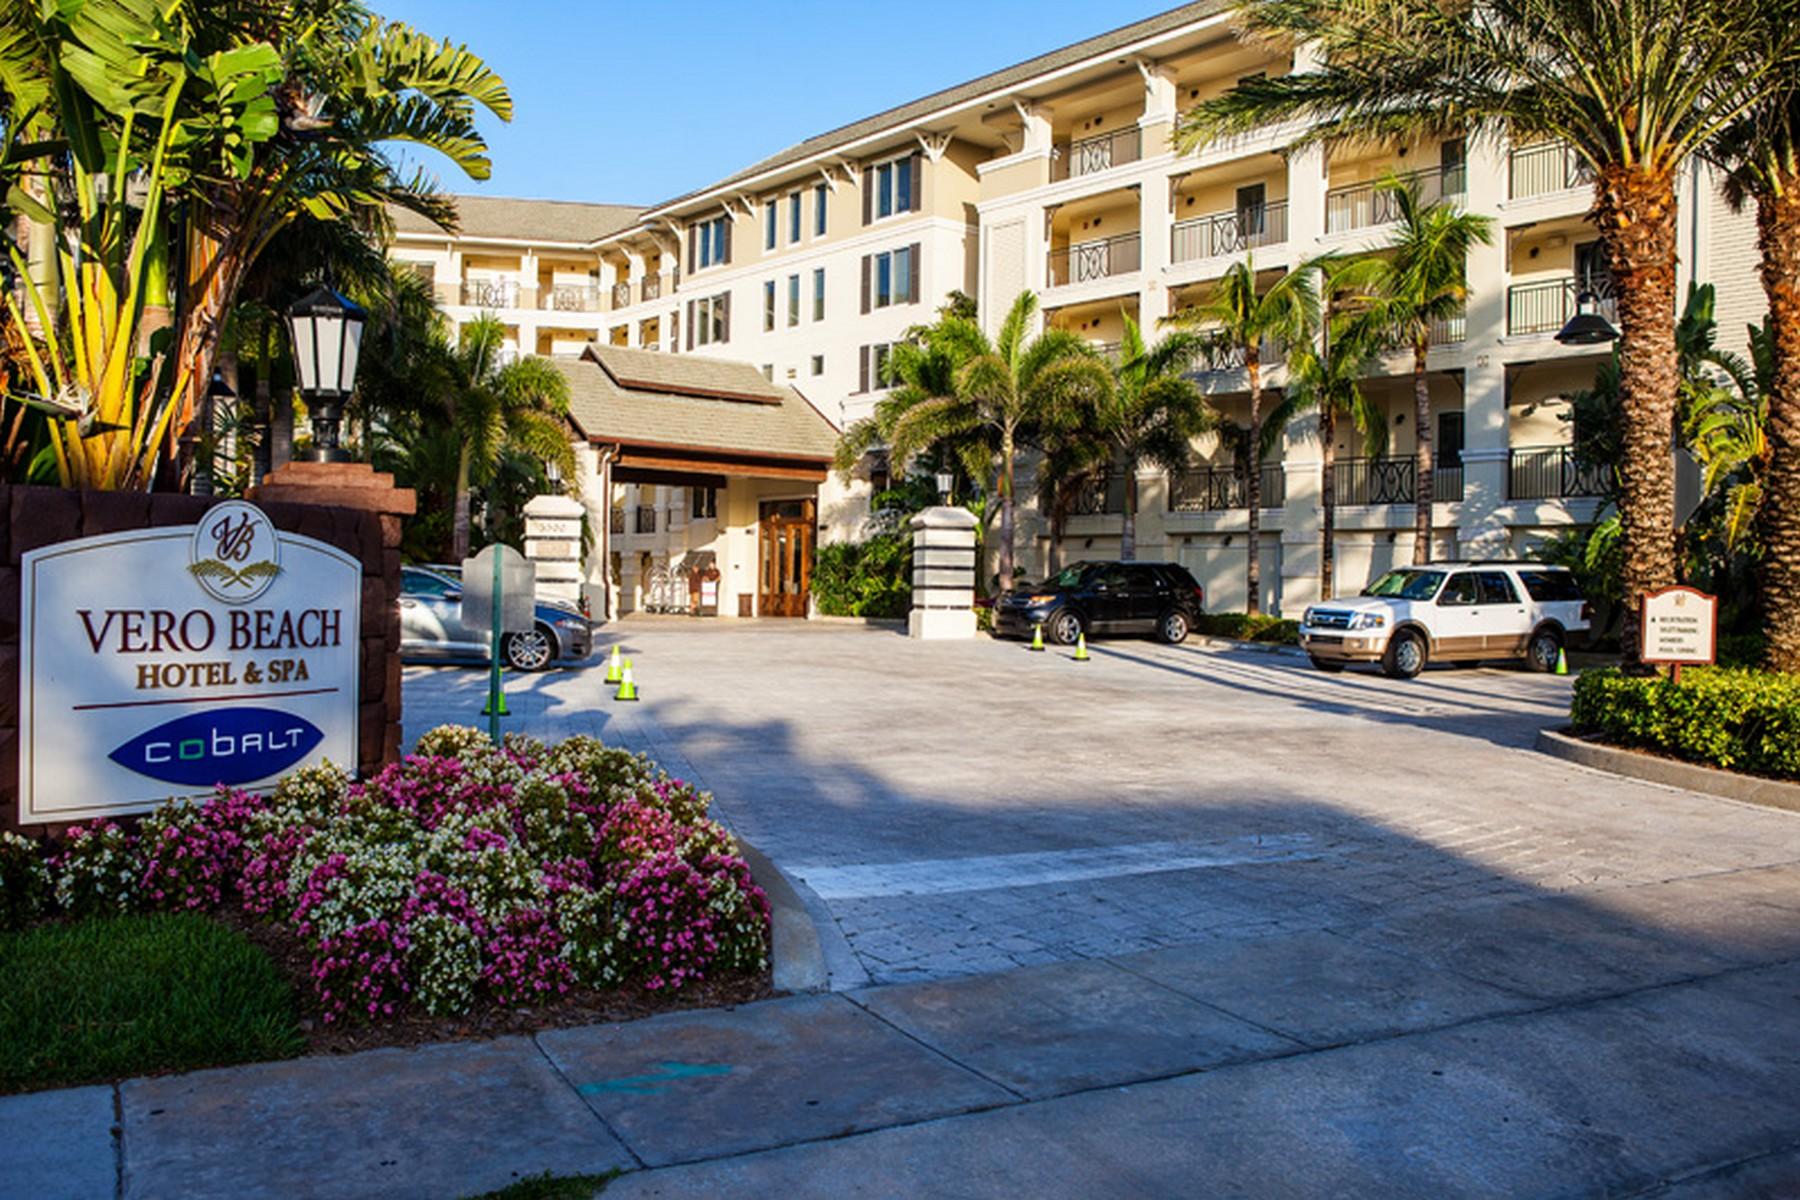 Condominium for Sale at Breathtaking Oceanfront unit at Vero Beach Hotel & Spa, a Condohotel 3500 Ocean Dr #105 Vero Beach, Florida, 32963 United States